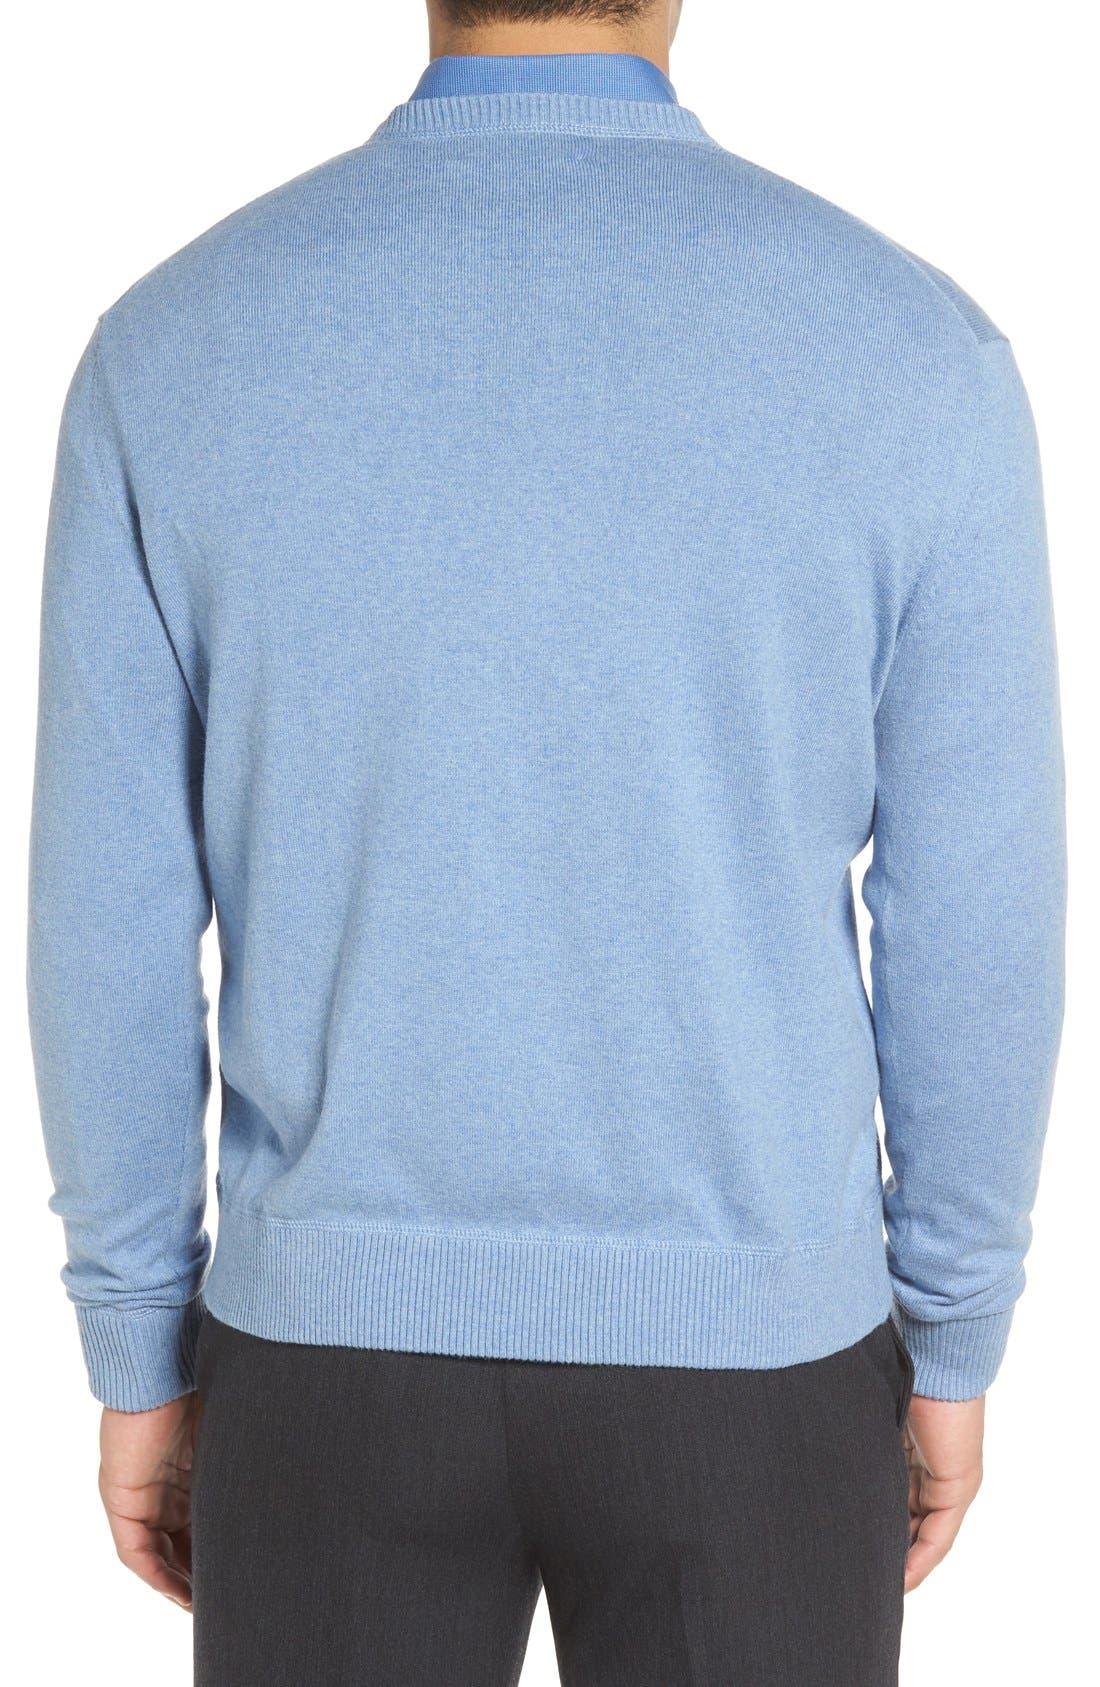 'Jersey Sport' Cotton Blend Crewneck Sweater,                             Alternate thumbnail 12, color,